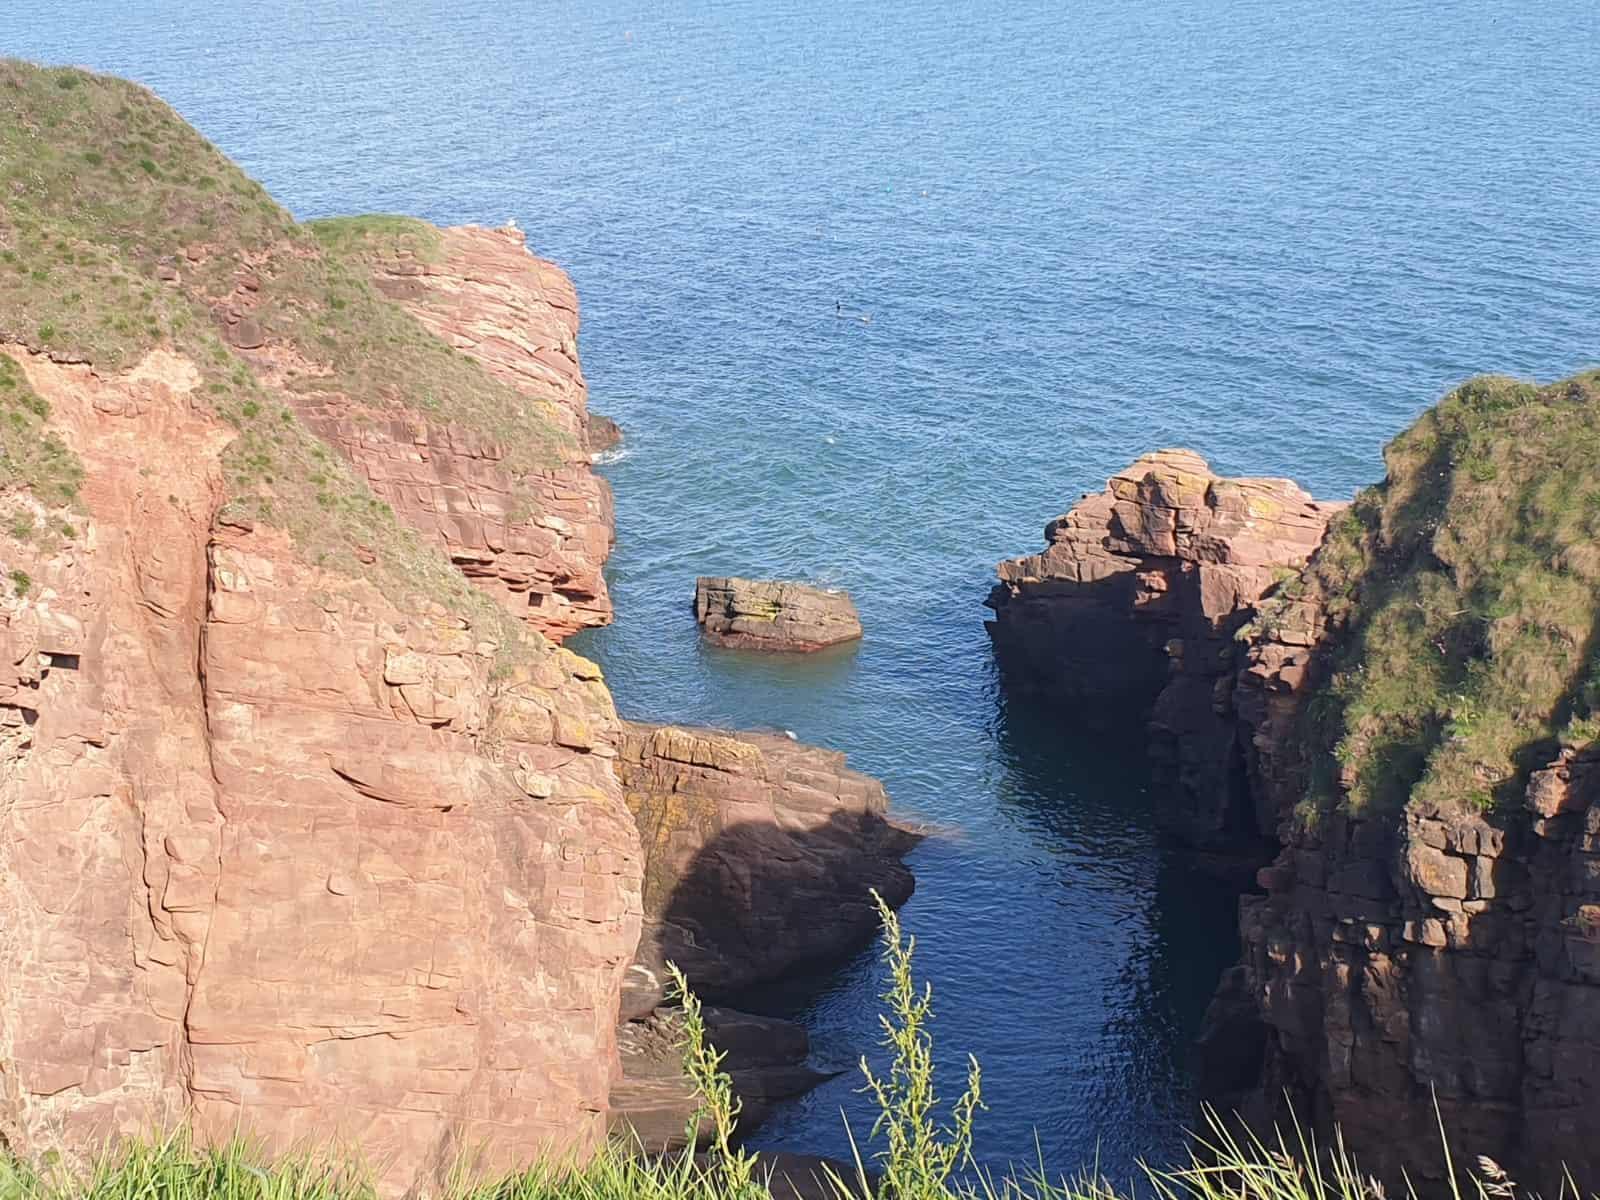 A photo from Arbroath Cliffs, Scotland